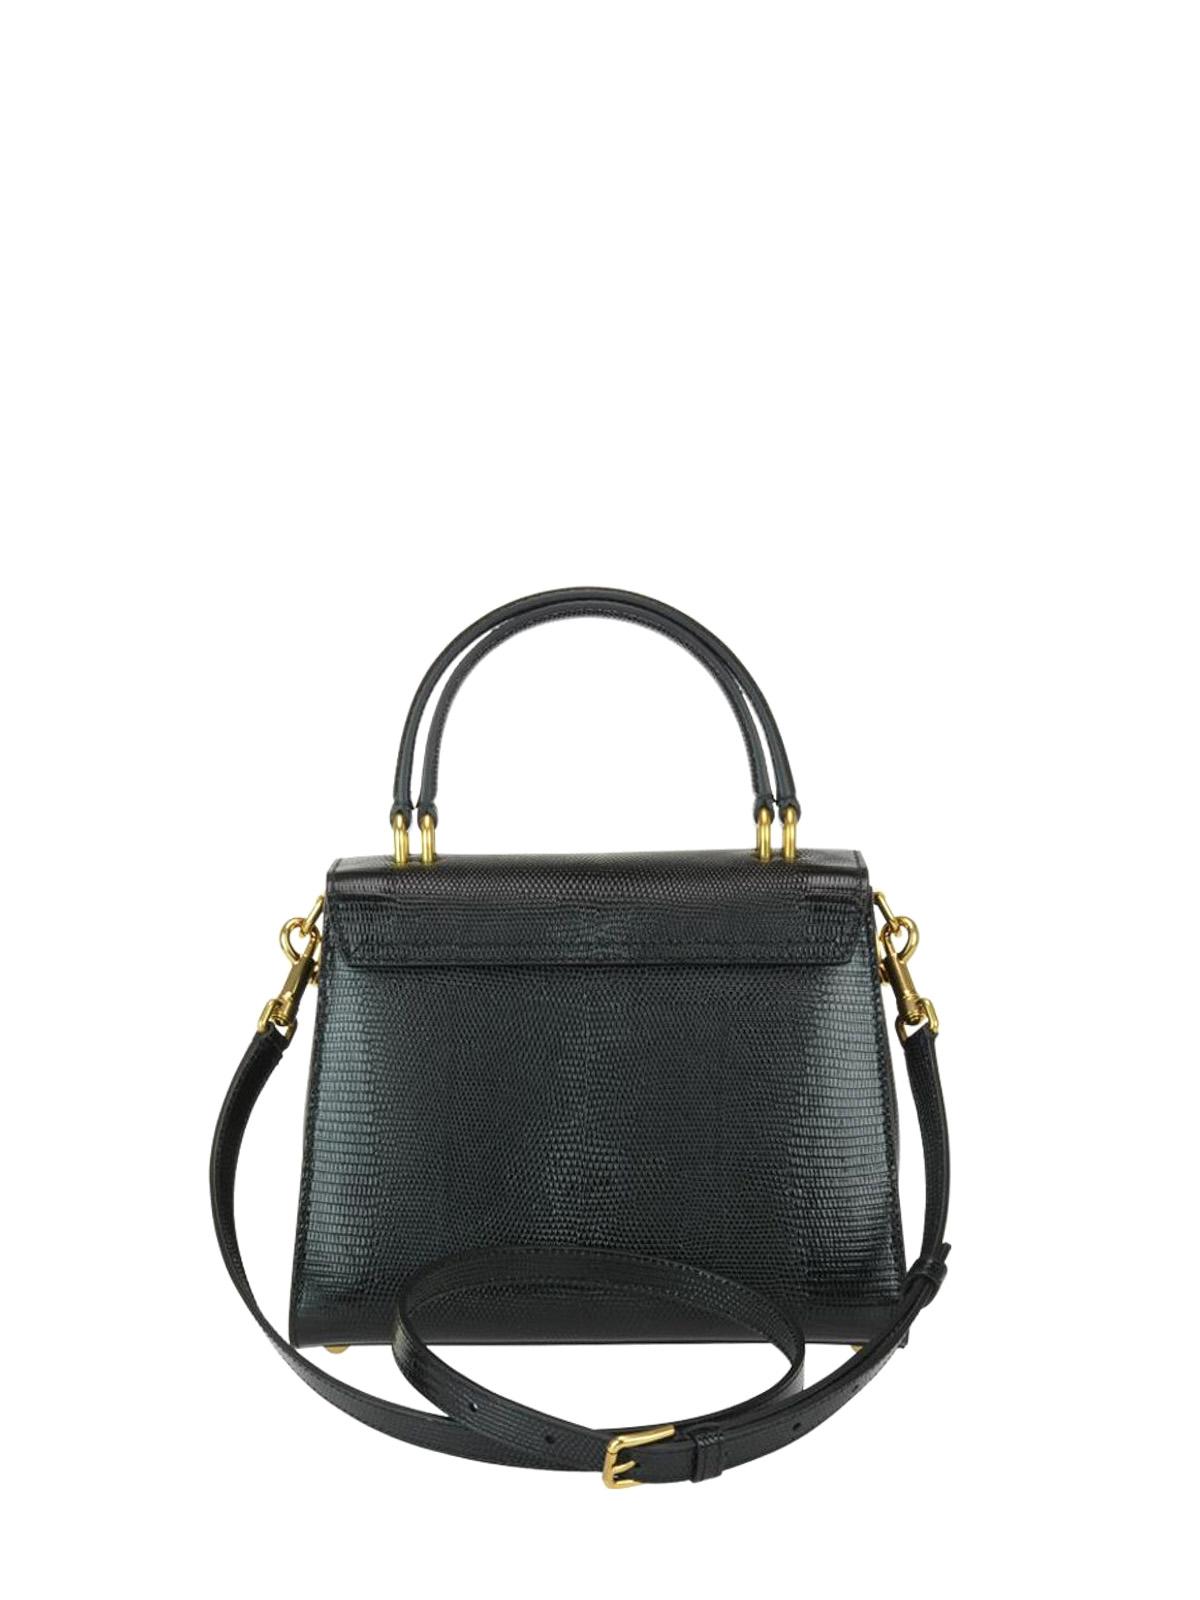 Dolce & Gabbana Borsa Welcome pelle stampa iguana borse